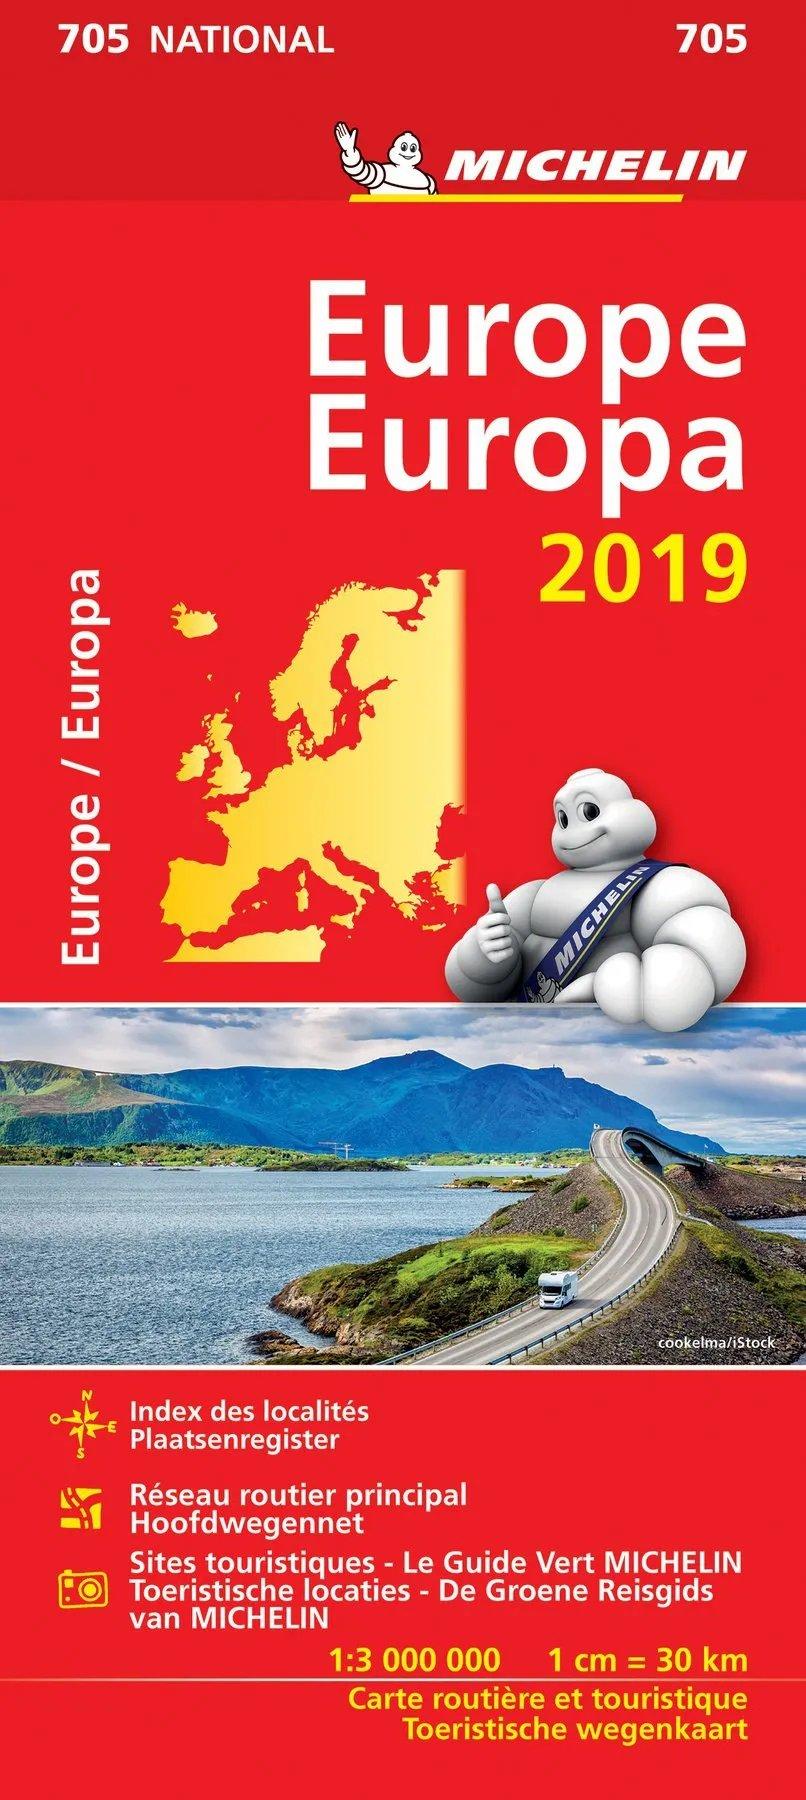 705 Europa 1:3.000.000 - 2019 9782067236332  Michelin Michelinkaarten Jaaredities  Landkaarten en wegenkaarten Europa